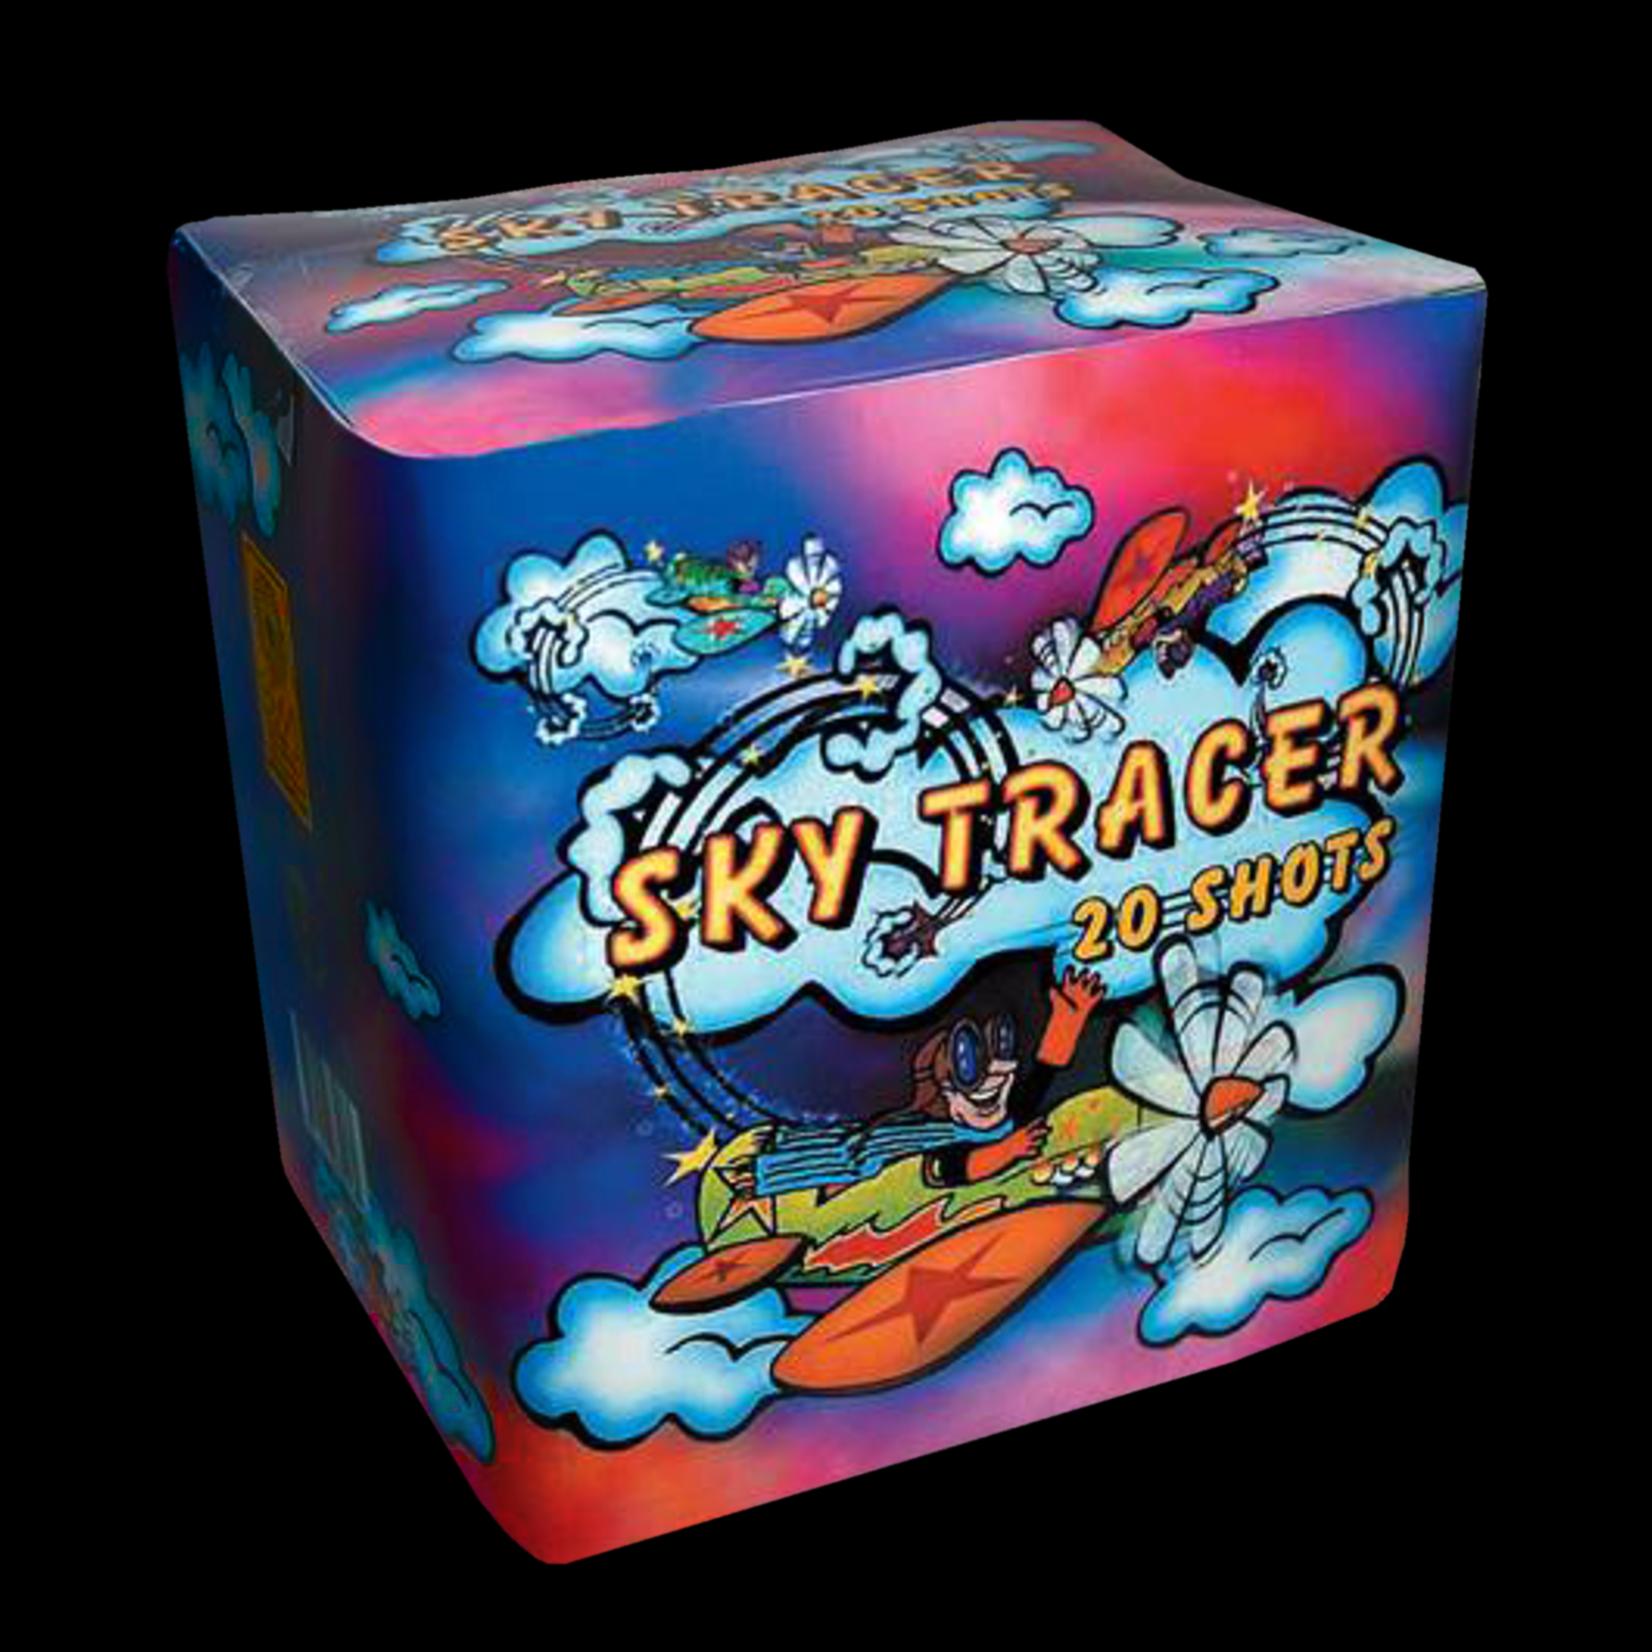 Sky Tracer